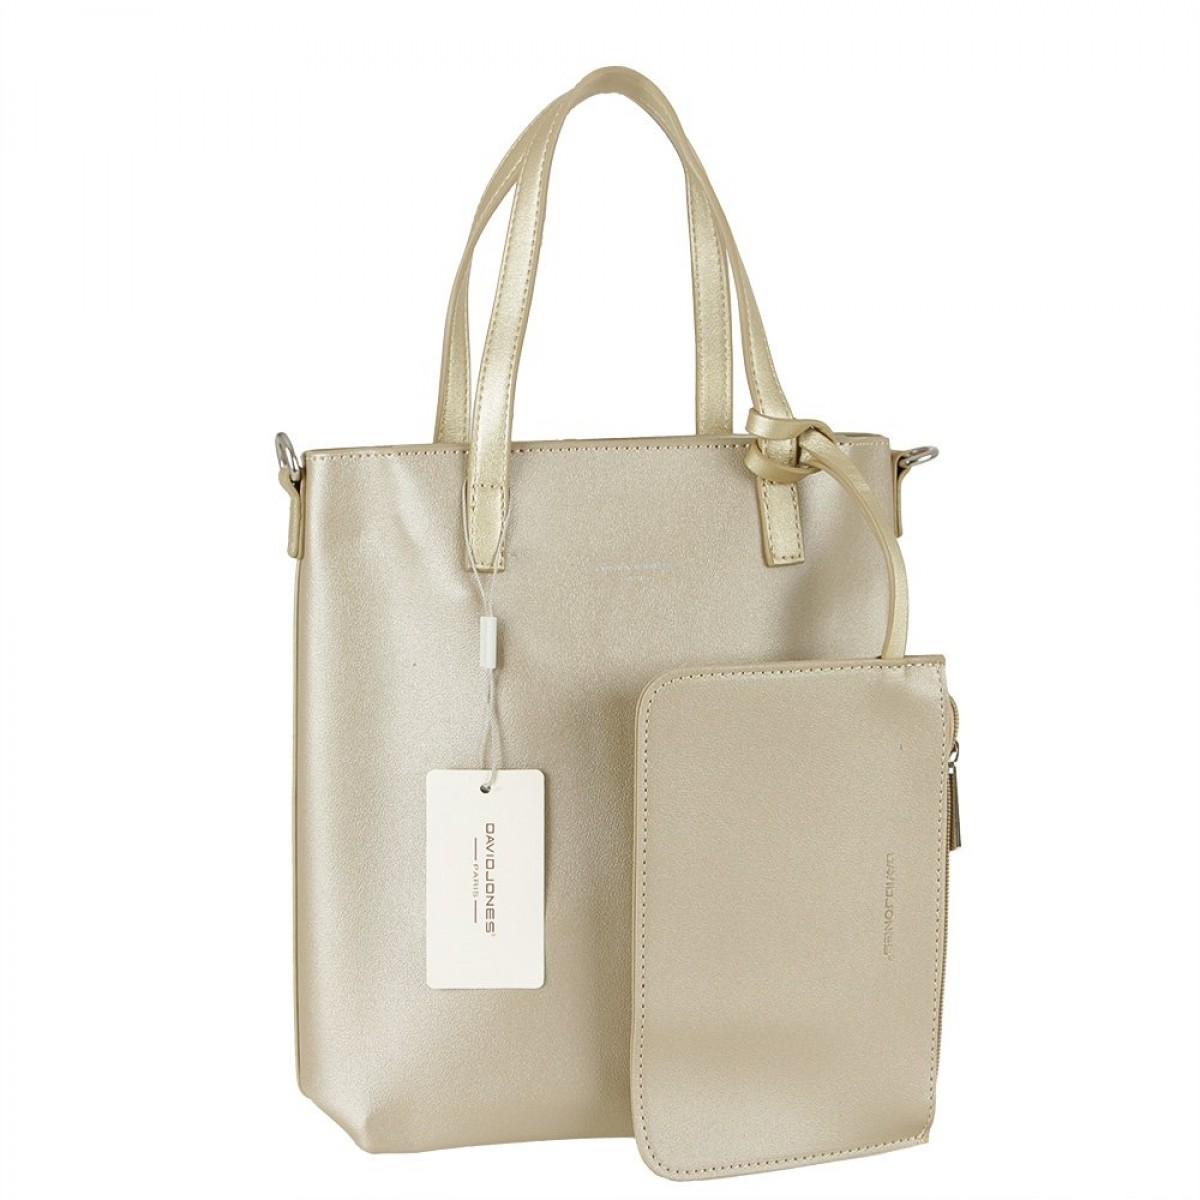 Жіноча сумка David Jones 6291-1 GOLD